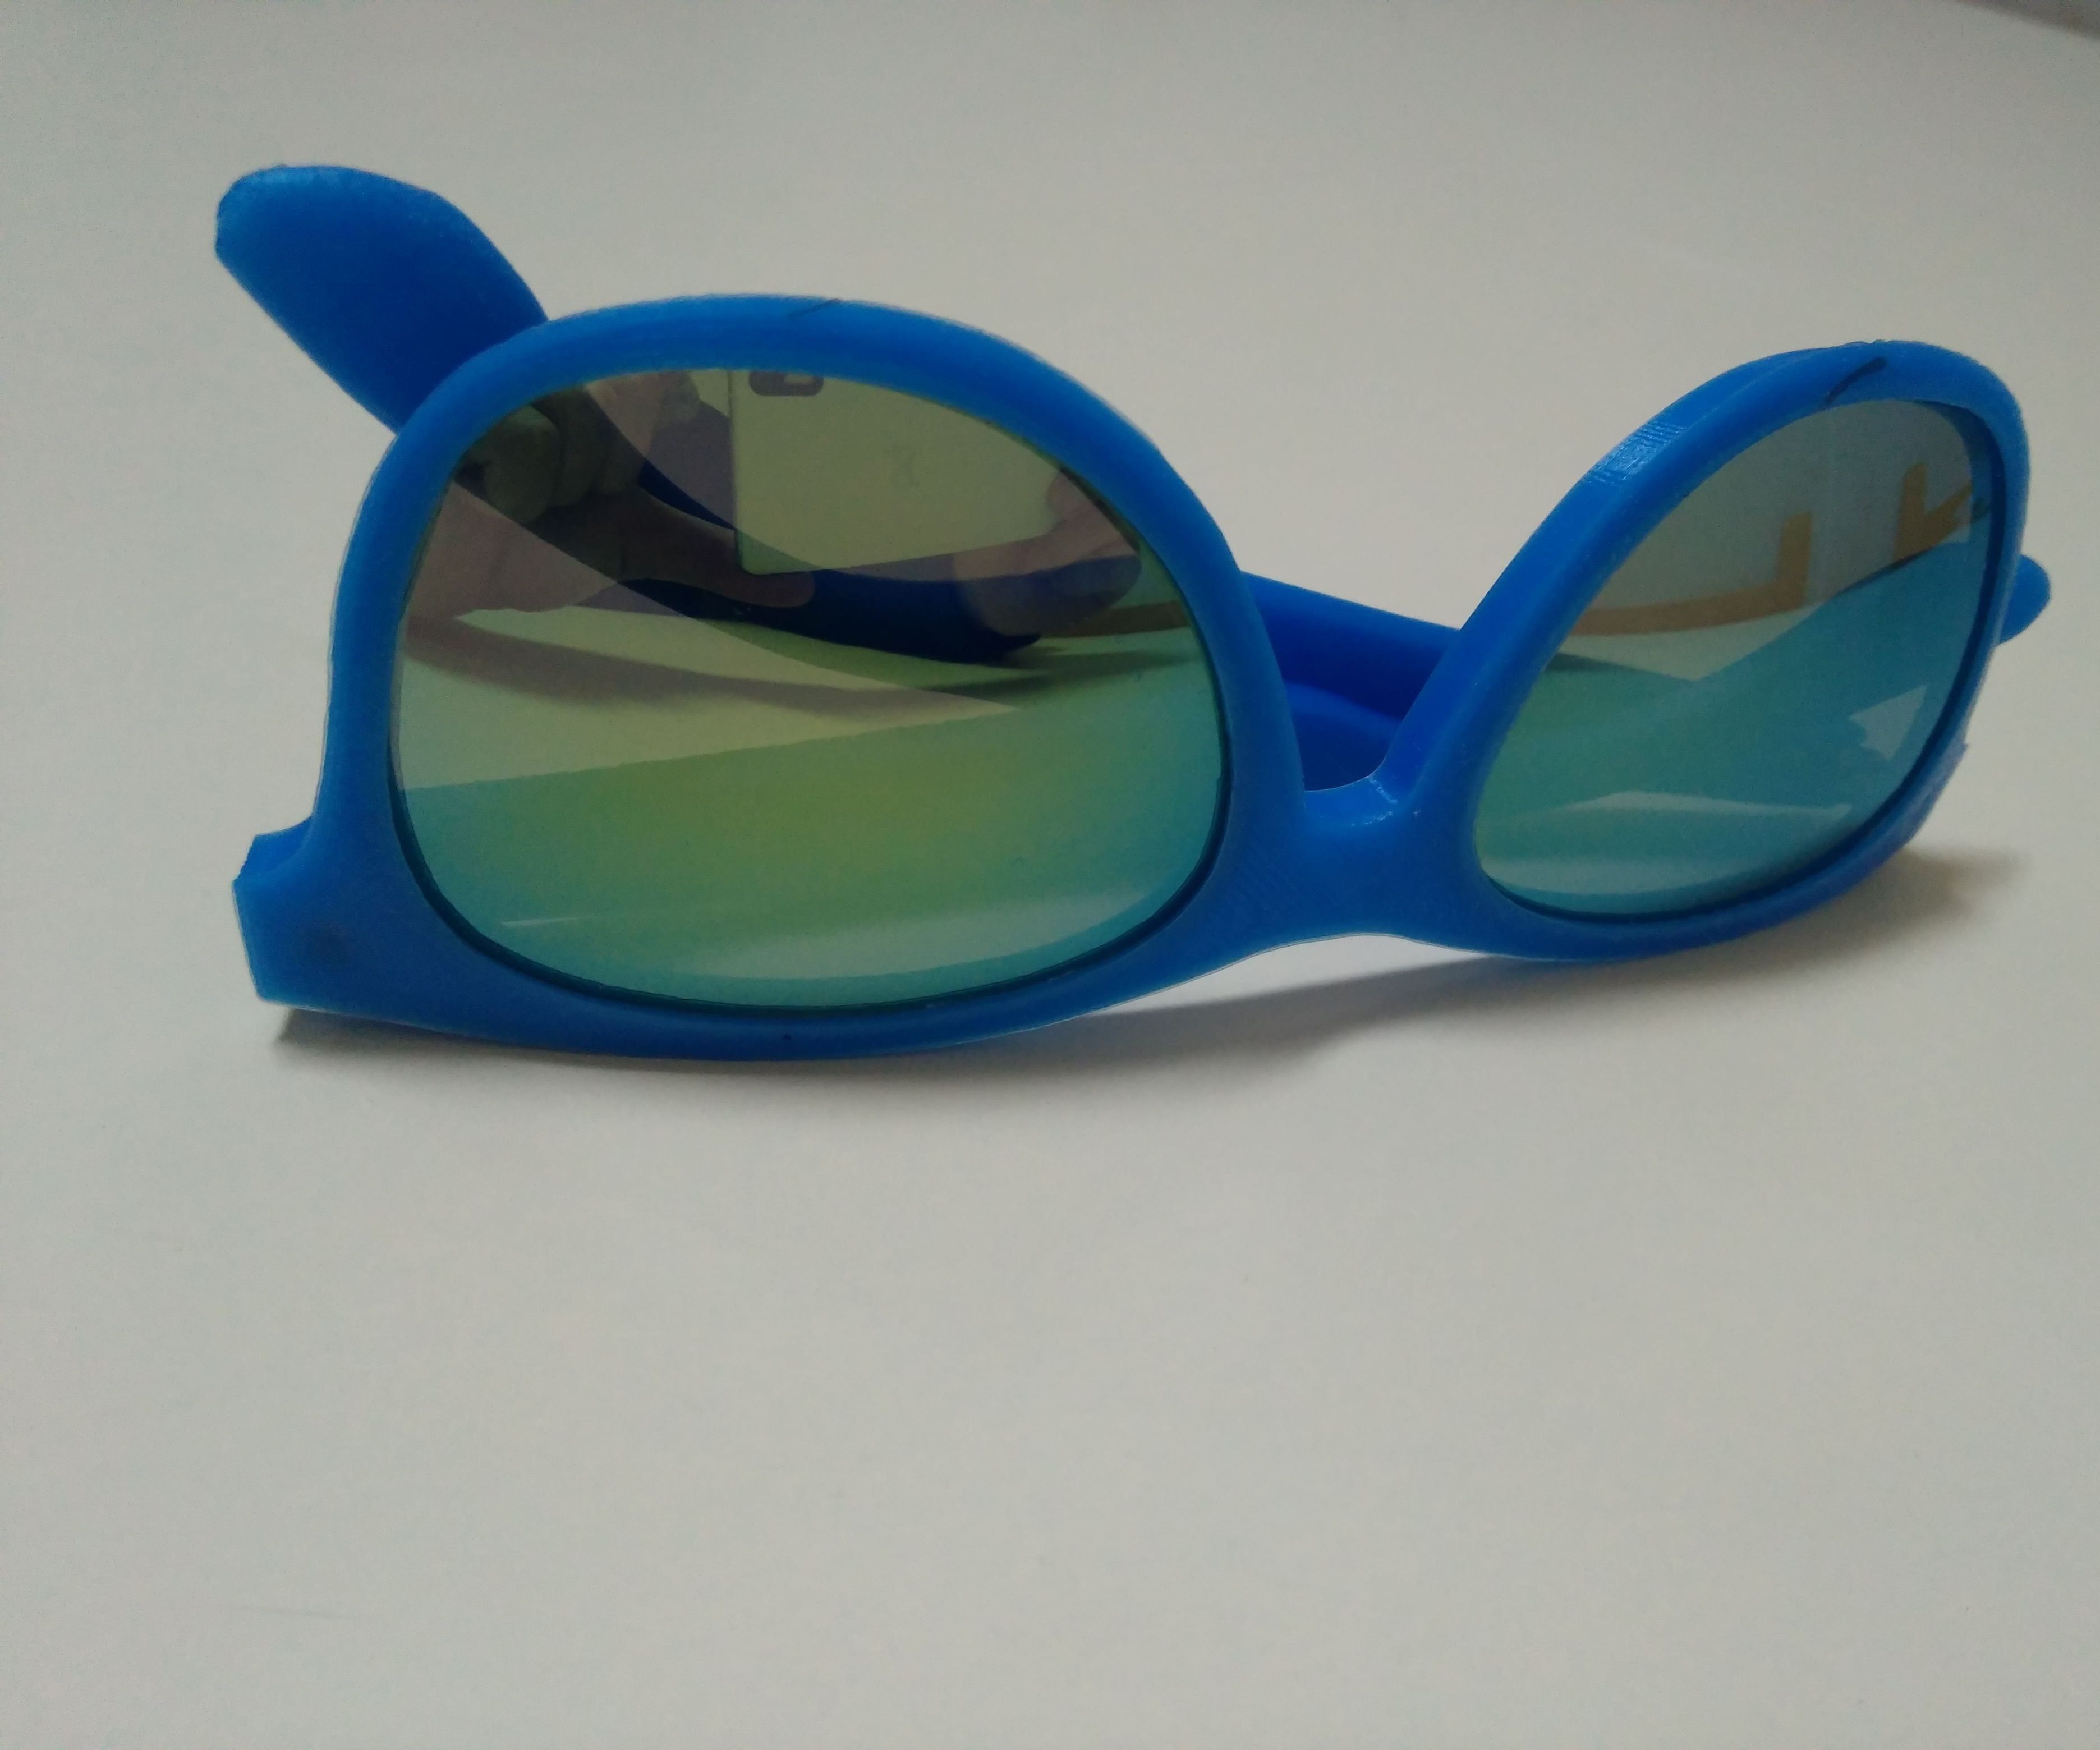 3D Printed Sunglasses (Wayfarer Style)